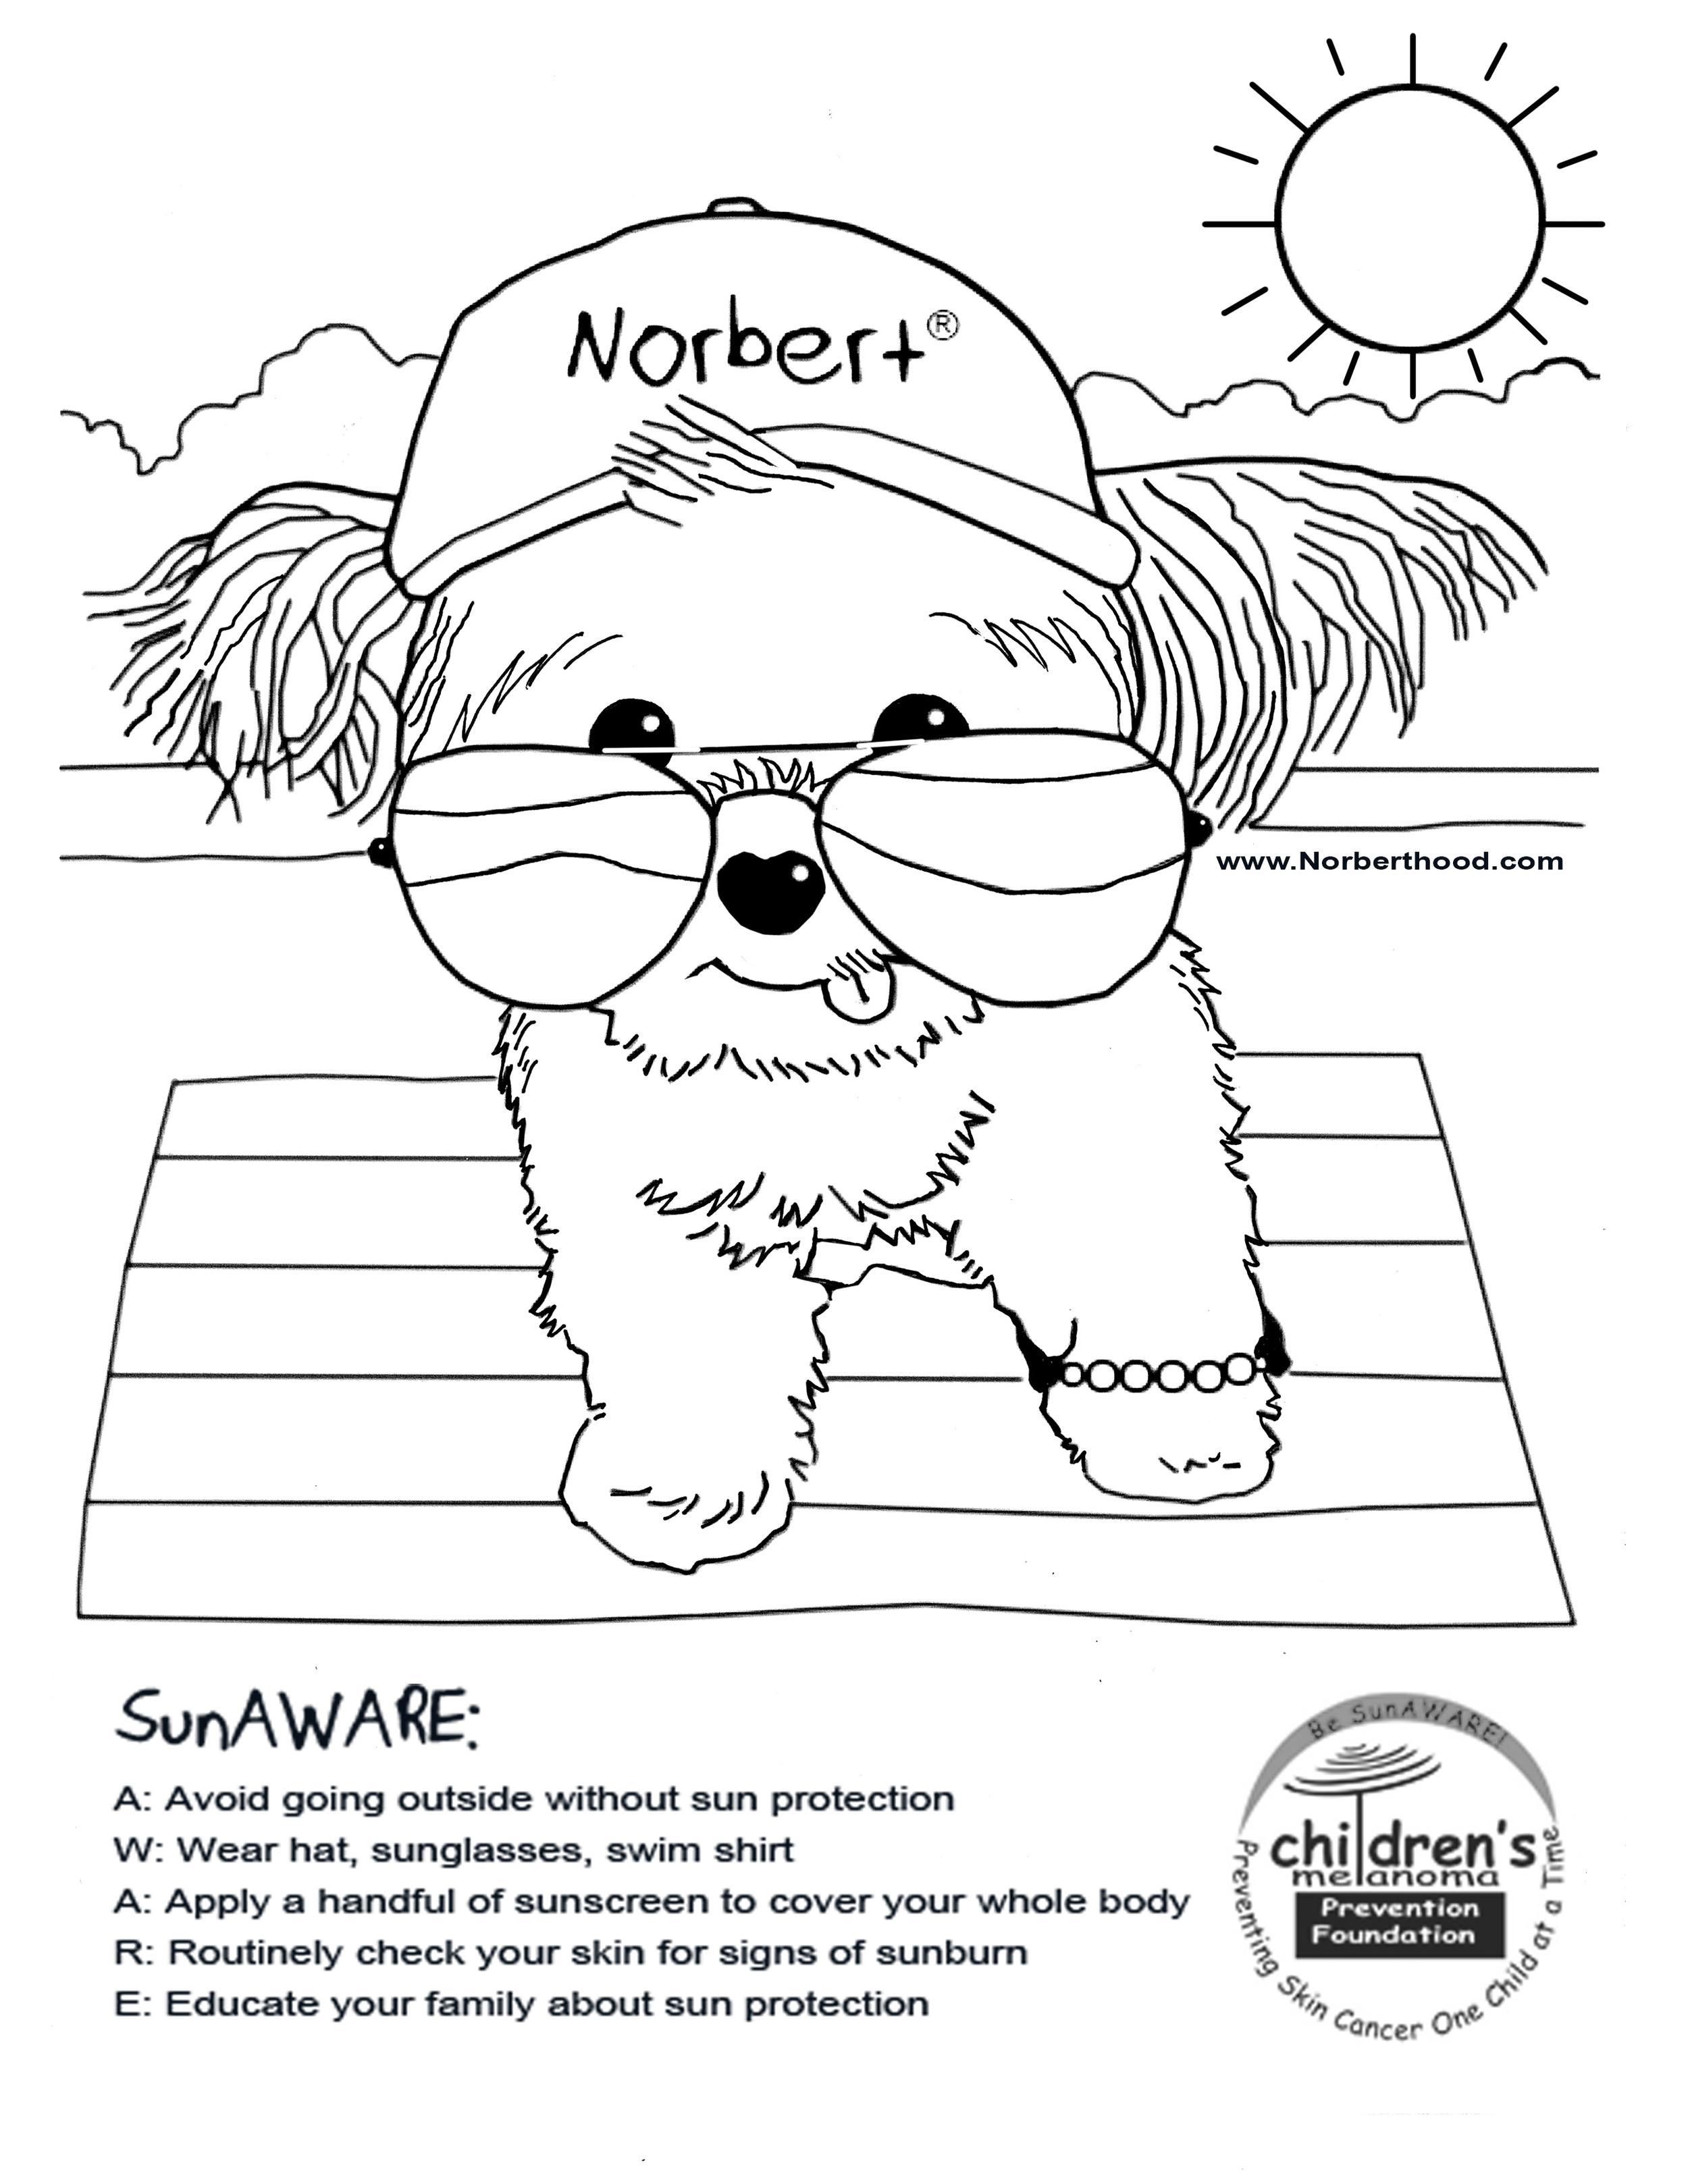 Final Norbert Coloring Page_SunAWARE.jpg